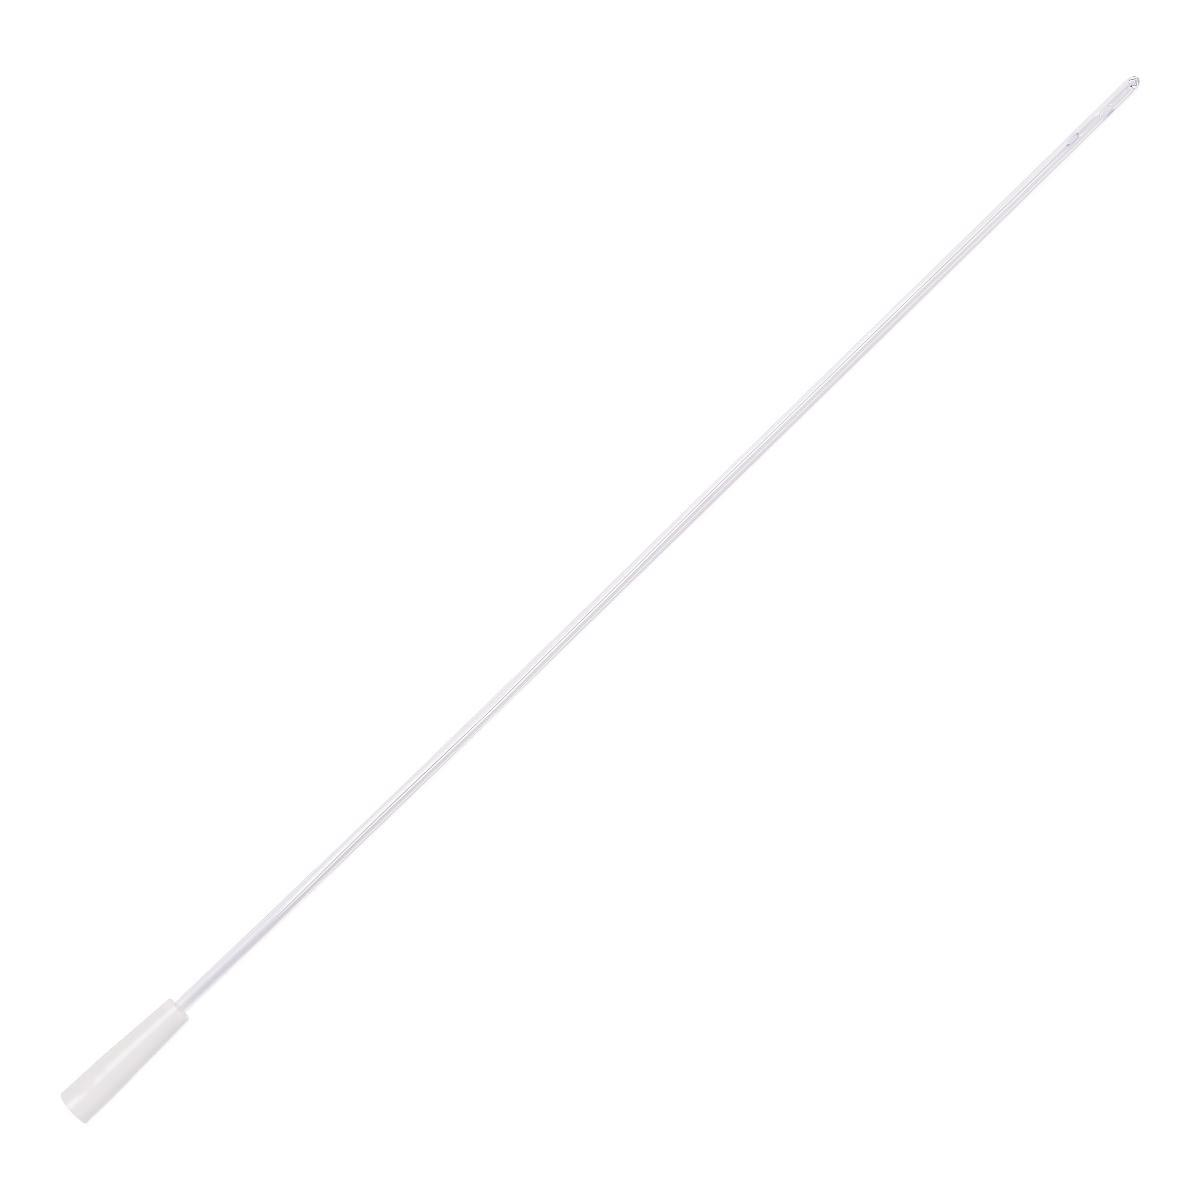 "Medline Industries Urethral Intermittent Catheter 12Fr 16"" L, Smooth Tip"